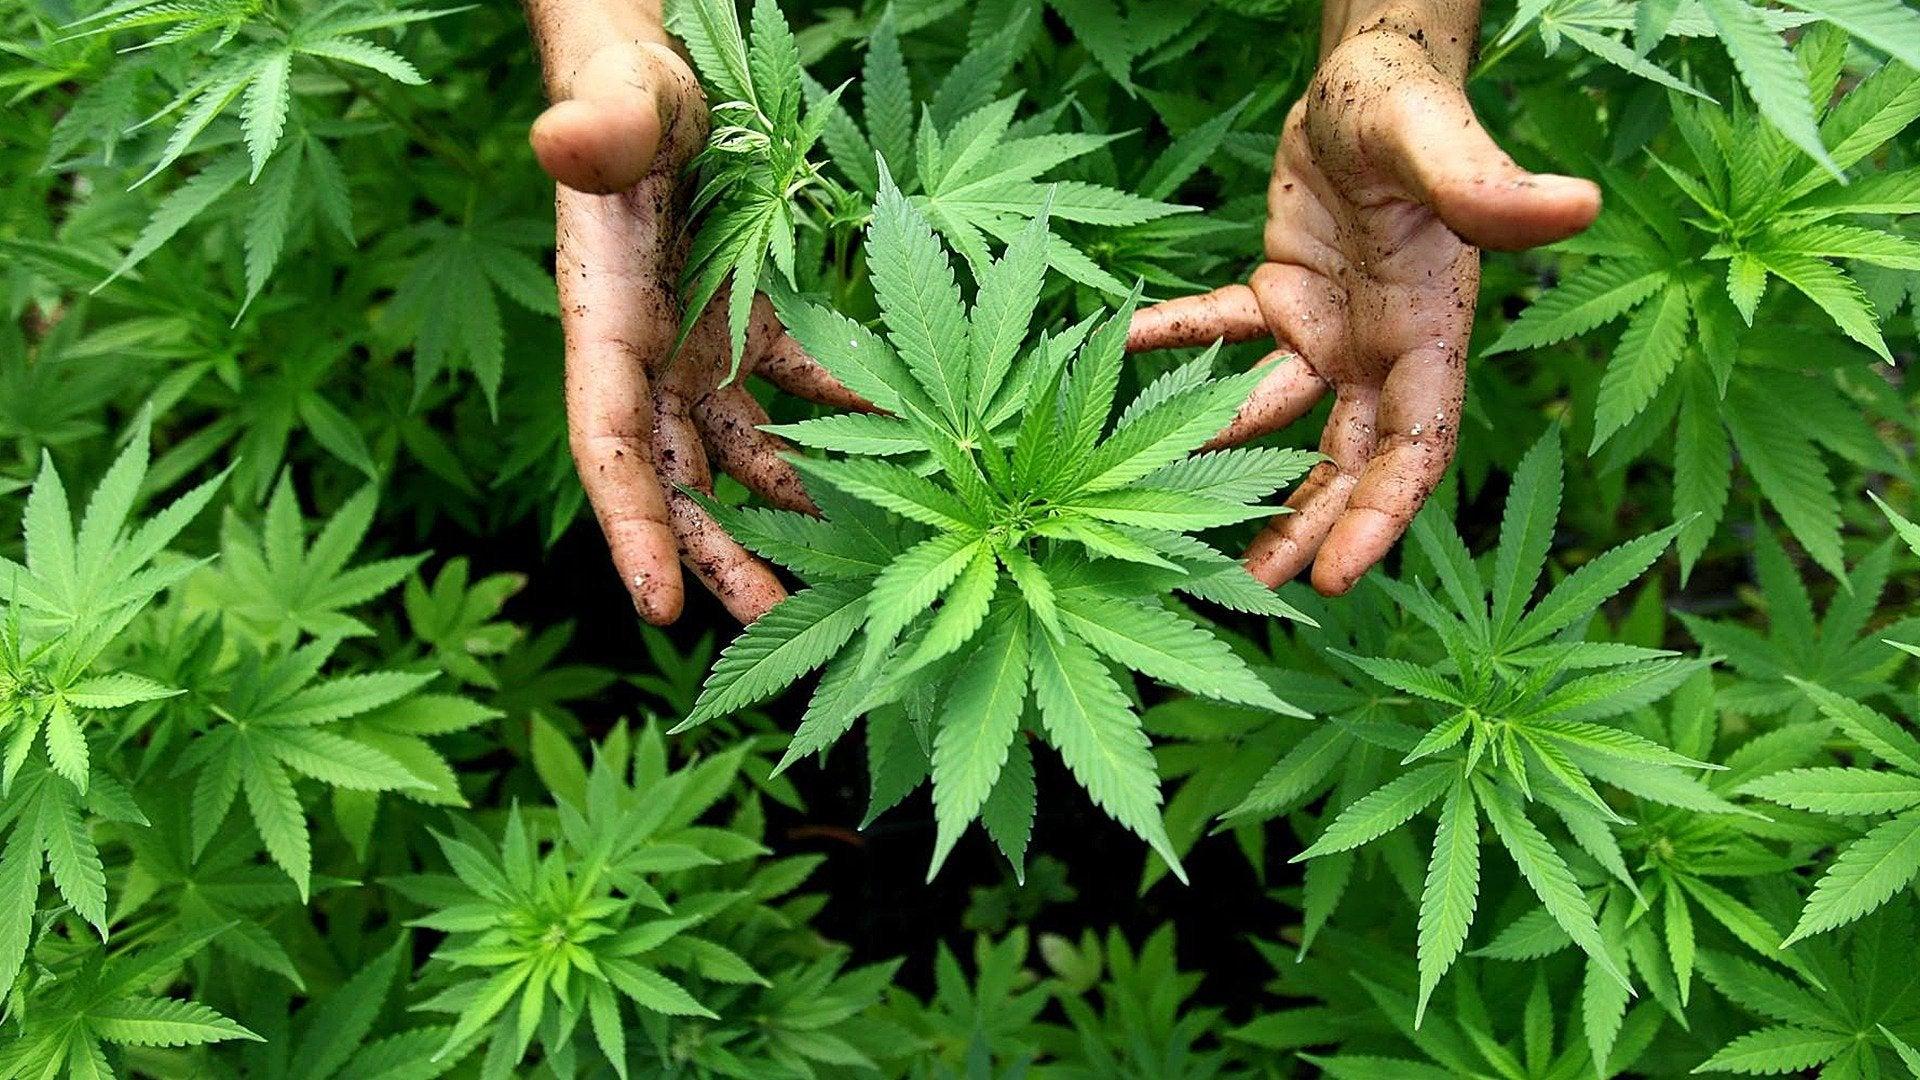 The Marijuana Revolution